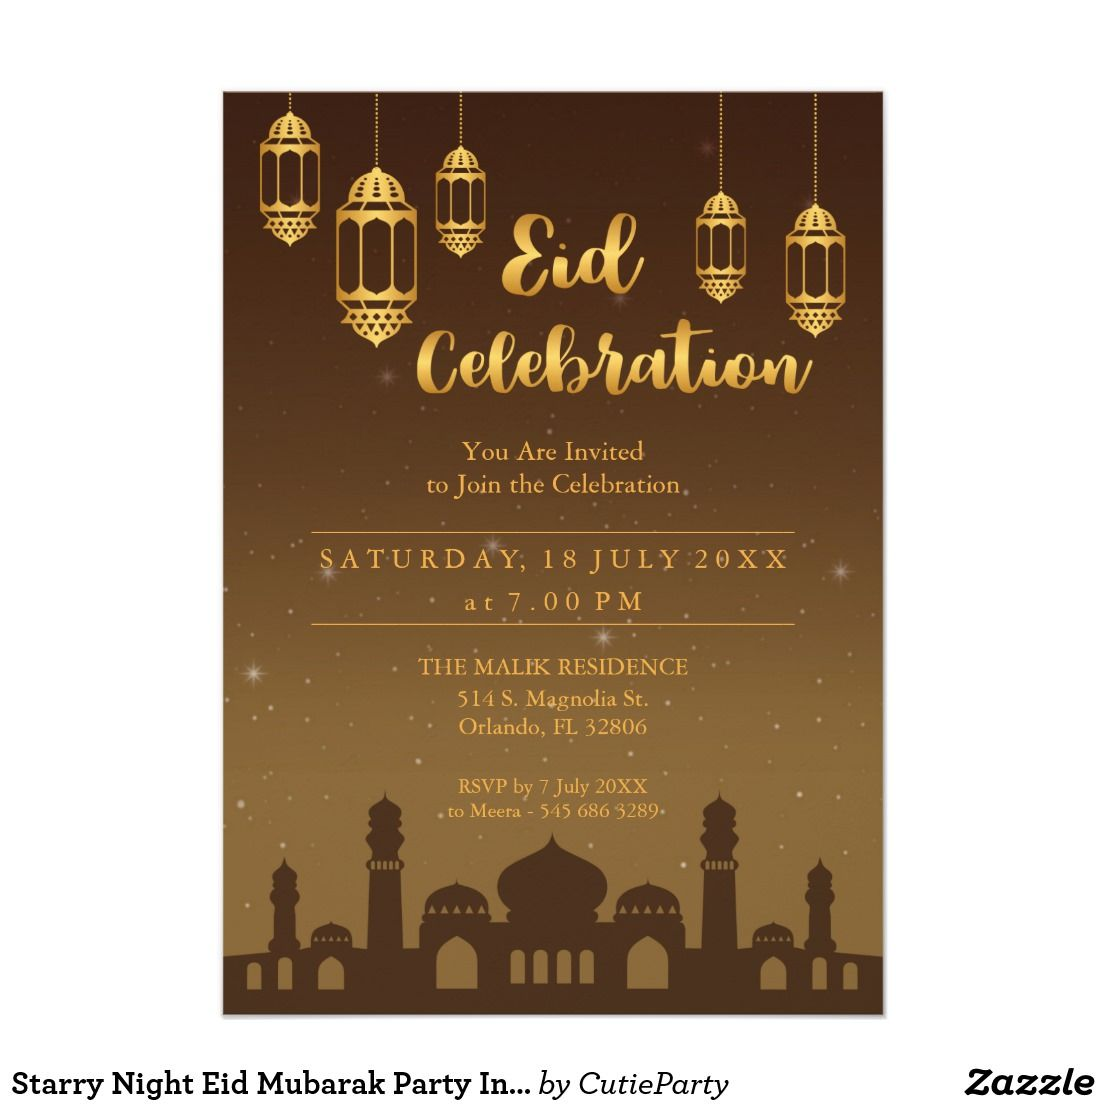 Starry Night Eid Mubarak Party Invitation Zazzle Com Eid